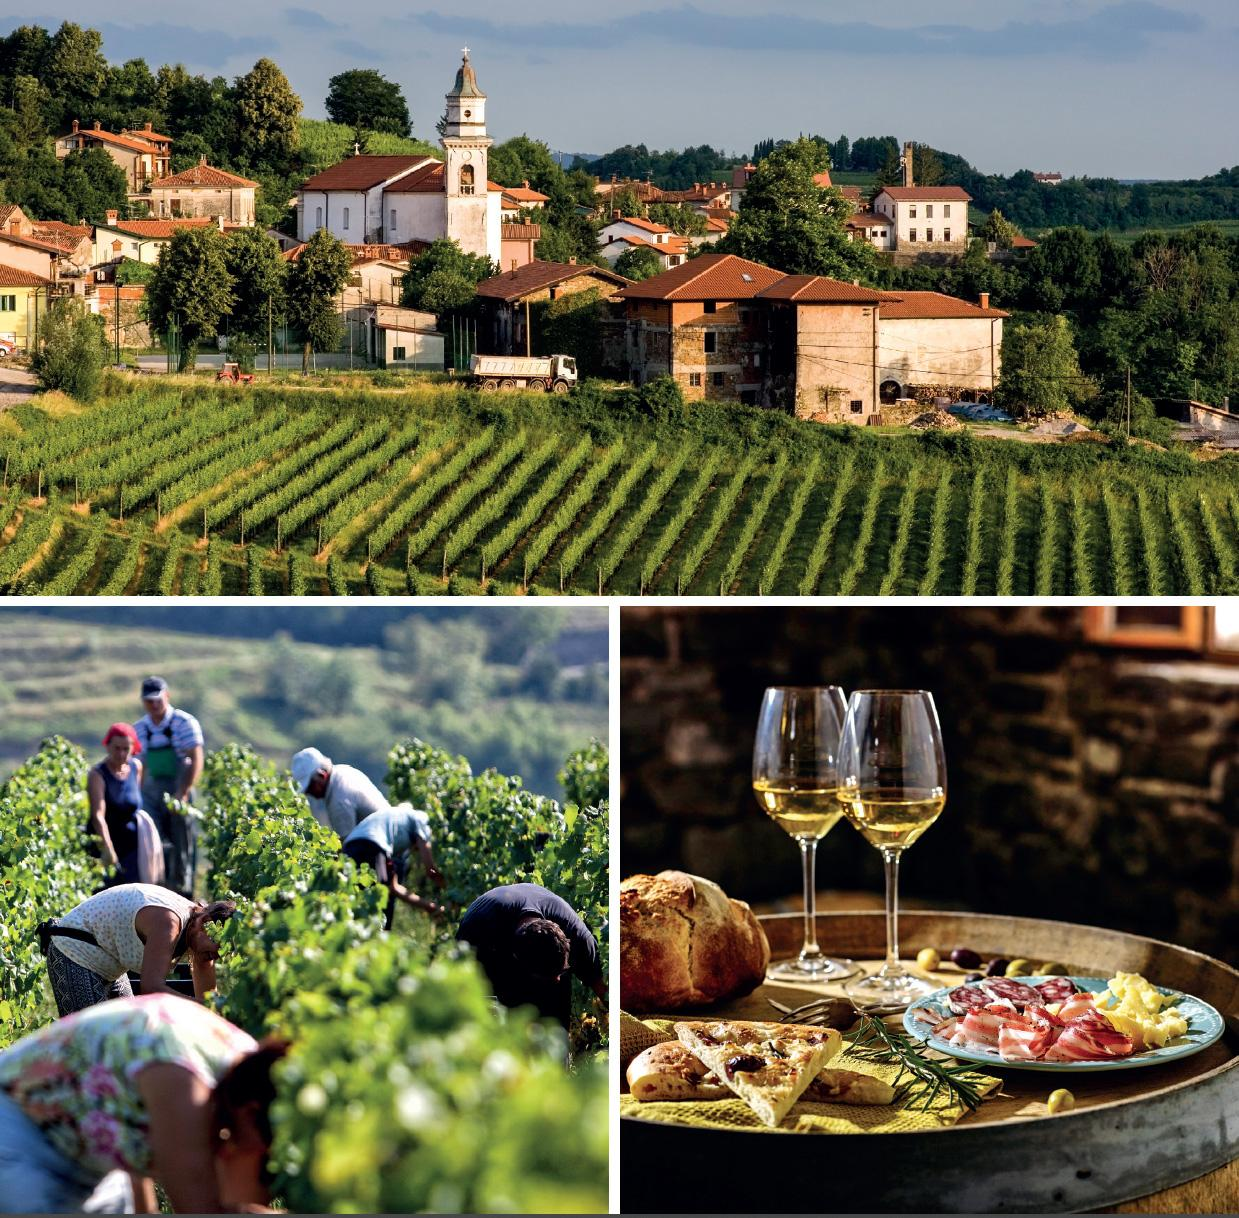 slovenian istra wine region